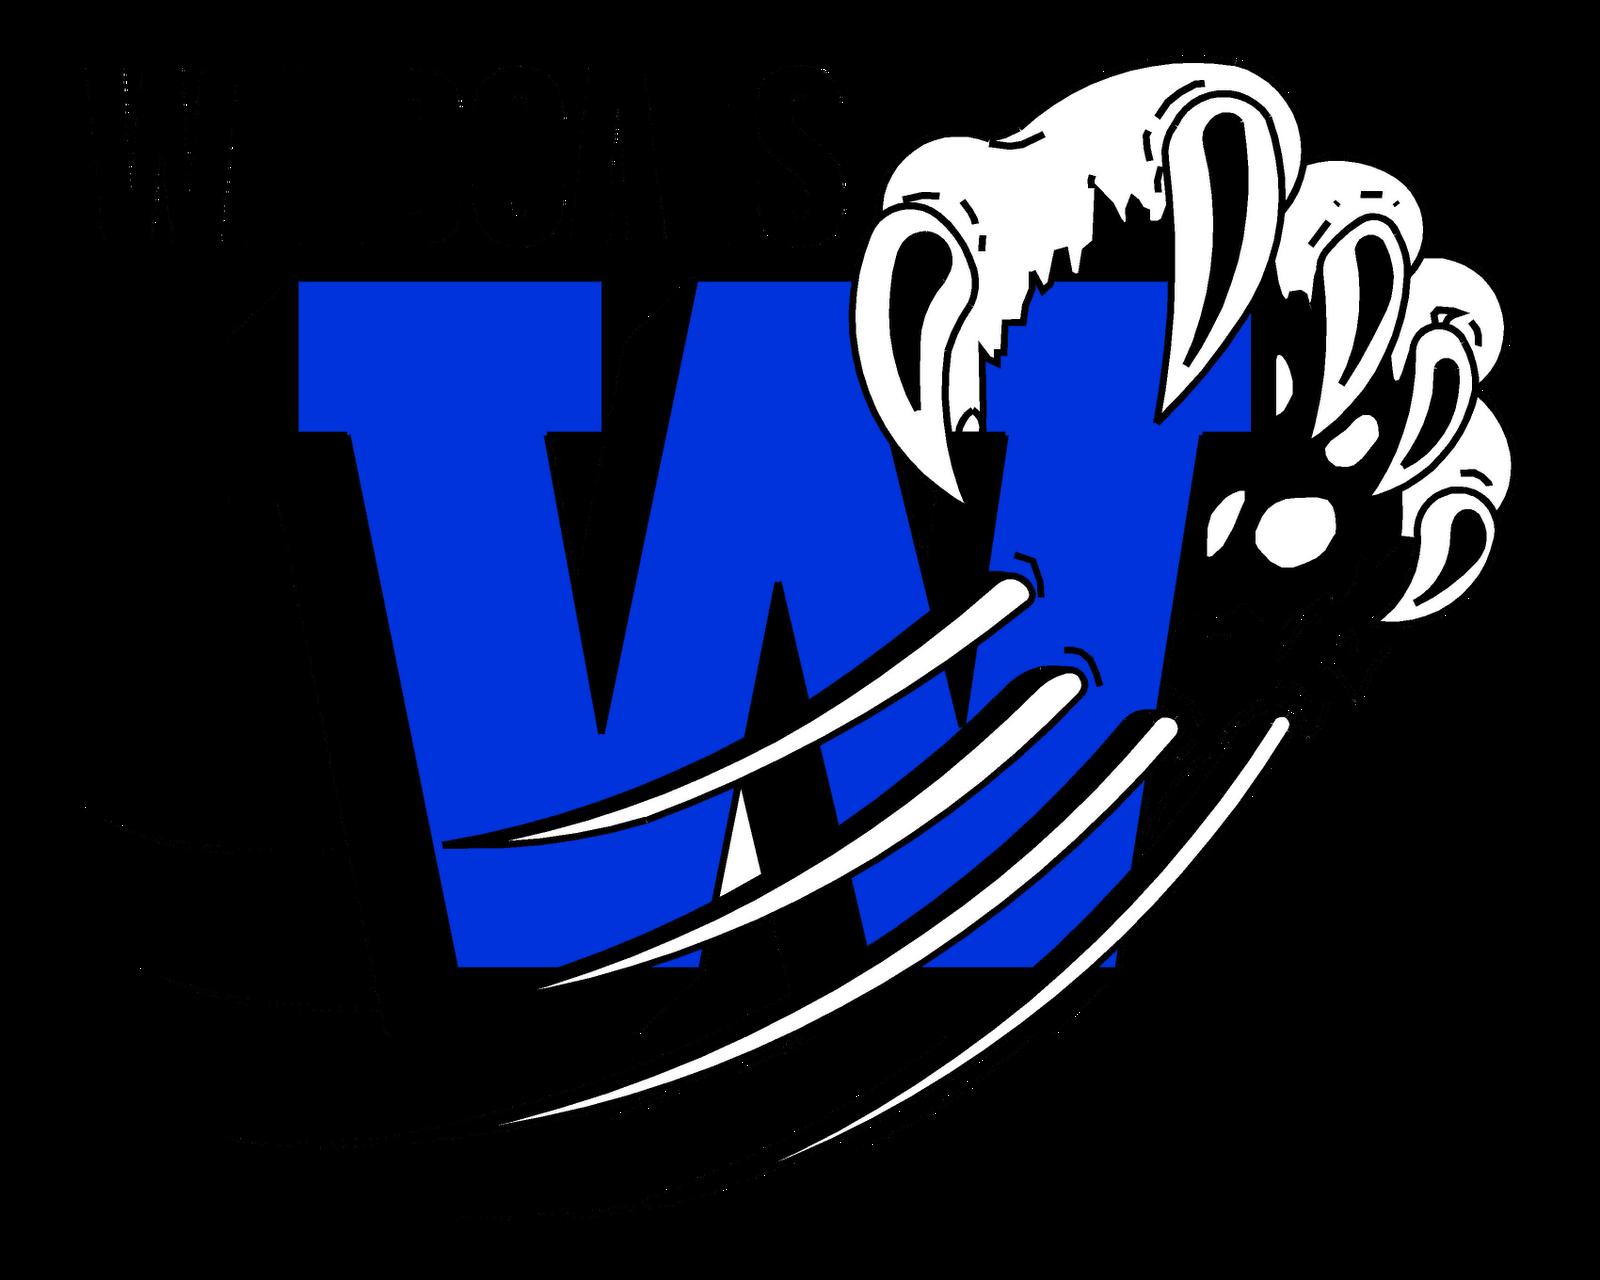 Wildcat school mascot clipart graphic black and white stock Ponca City Wildcat Baseball - Home graphic black and white stock